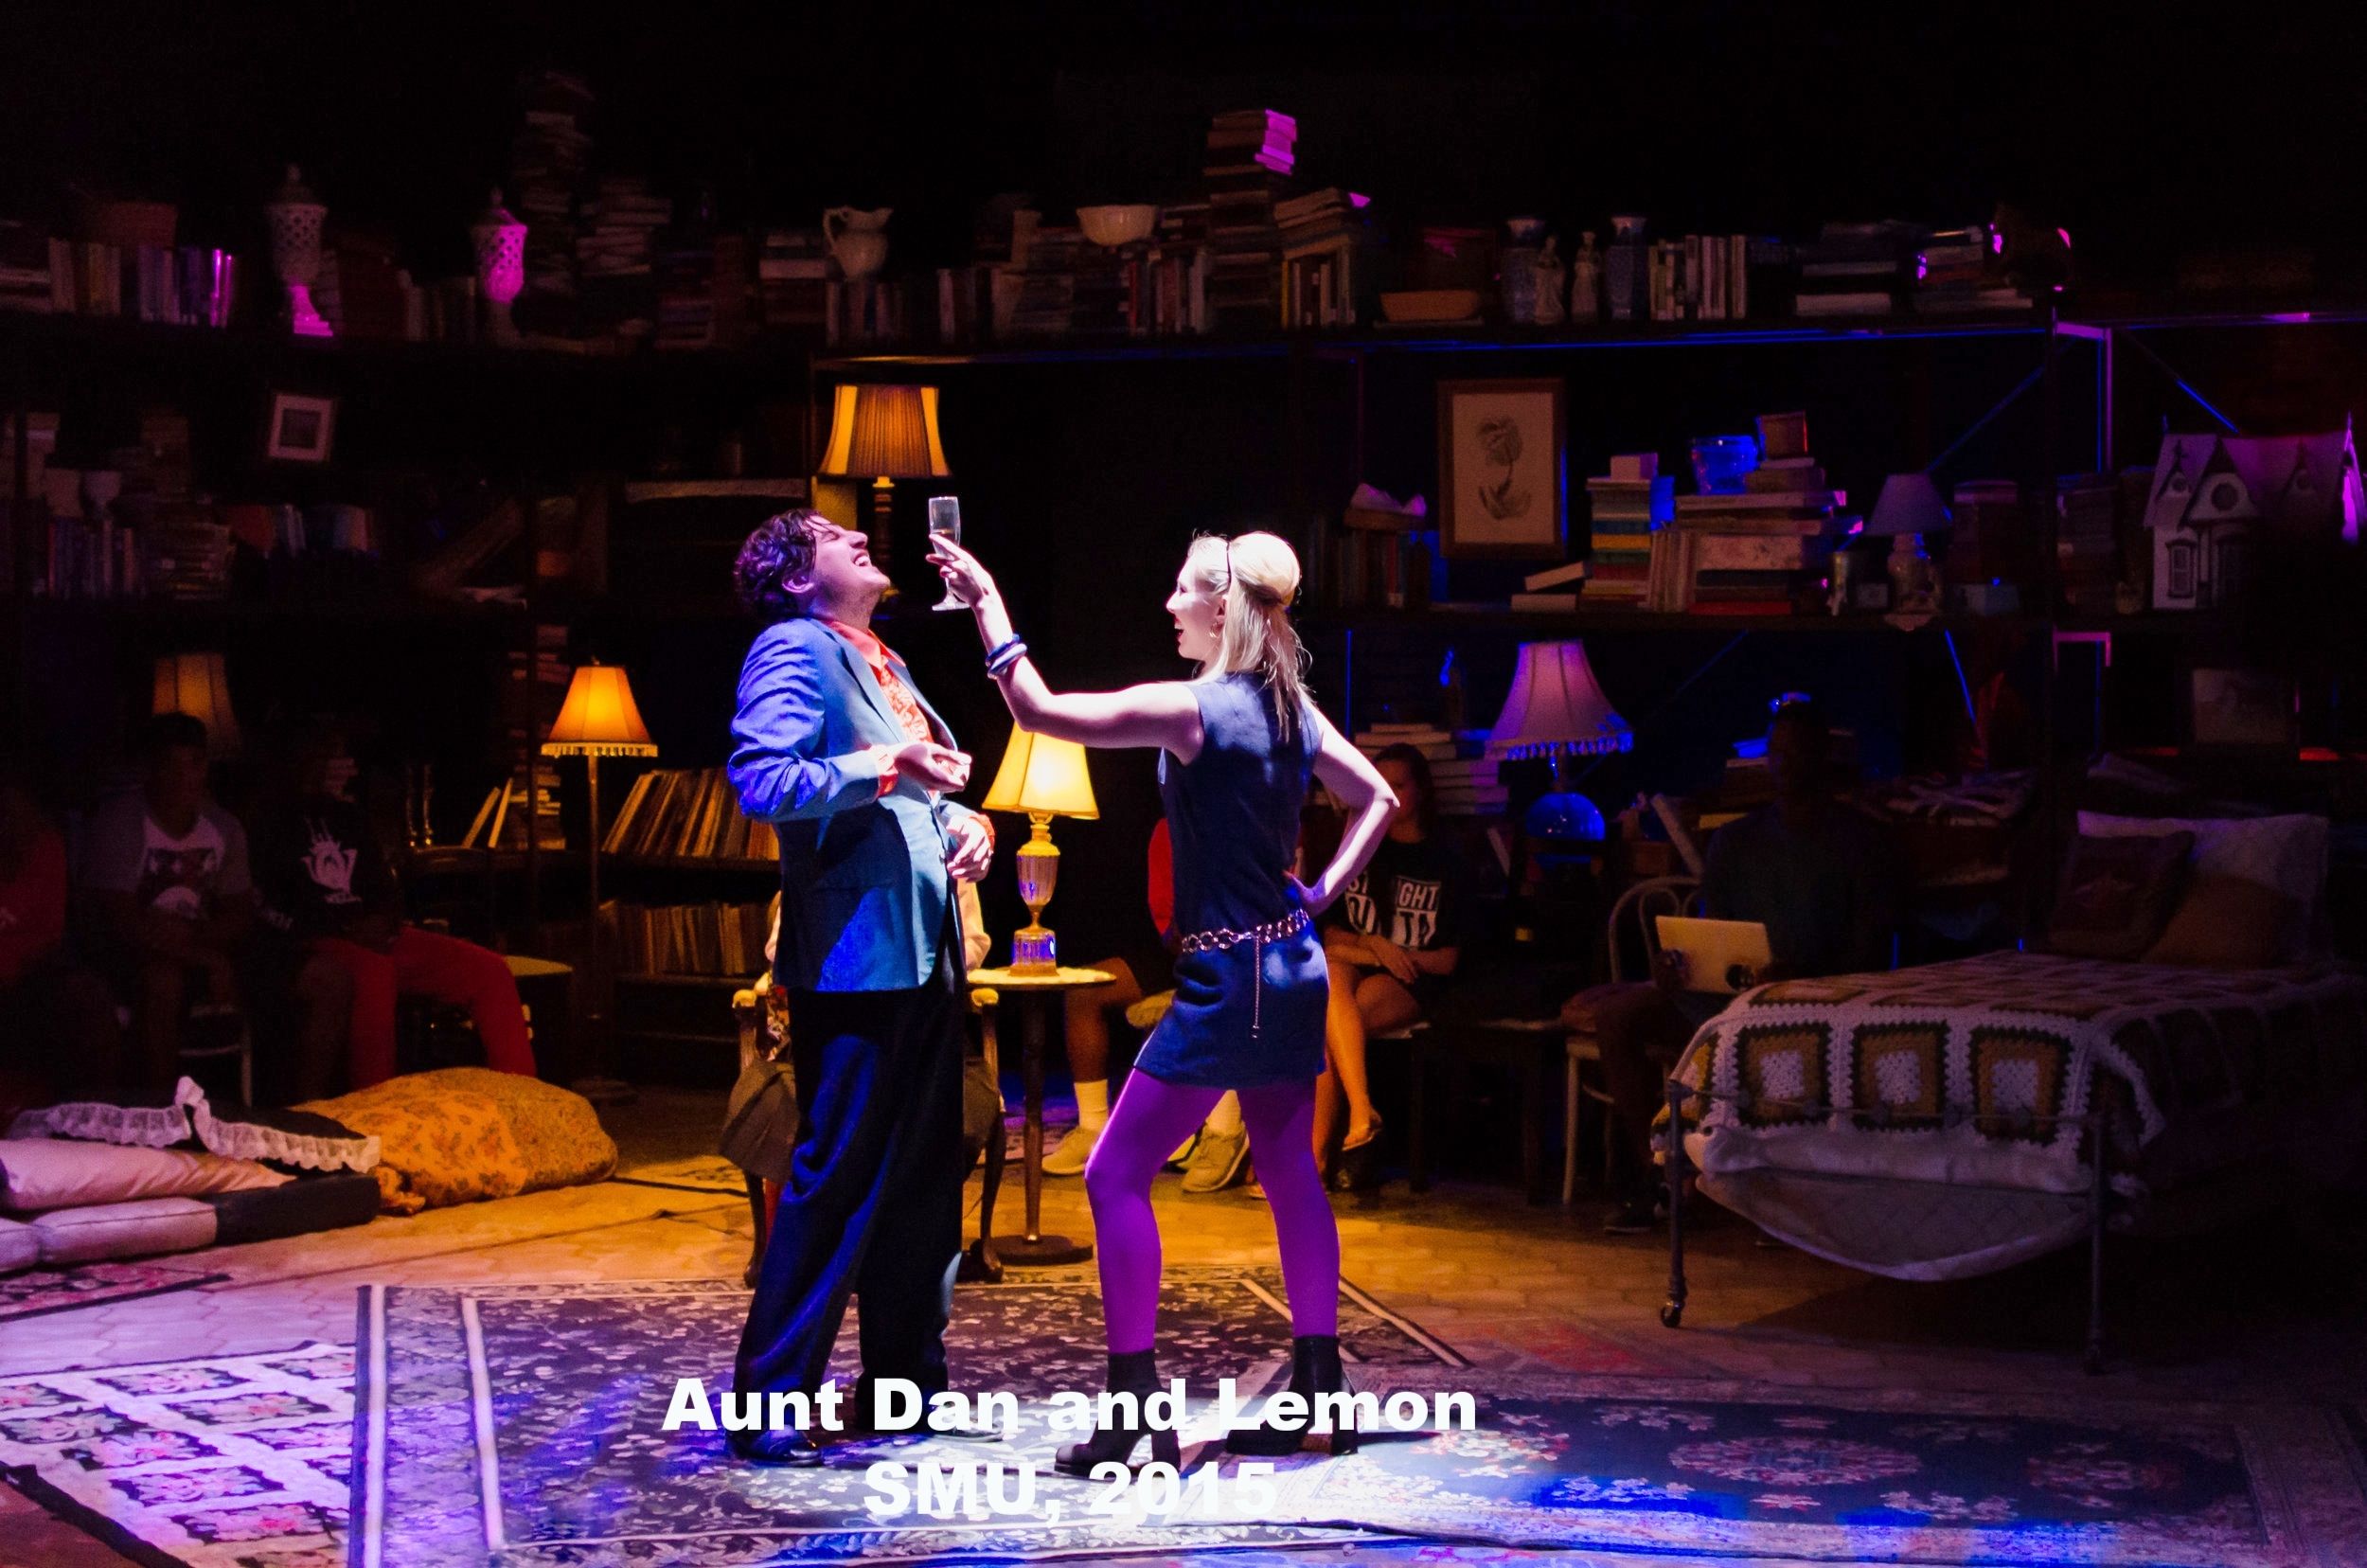 Aunt Dan & Lemon Raimondo & Mindy.jpg